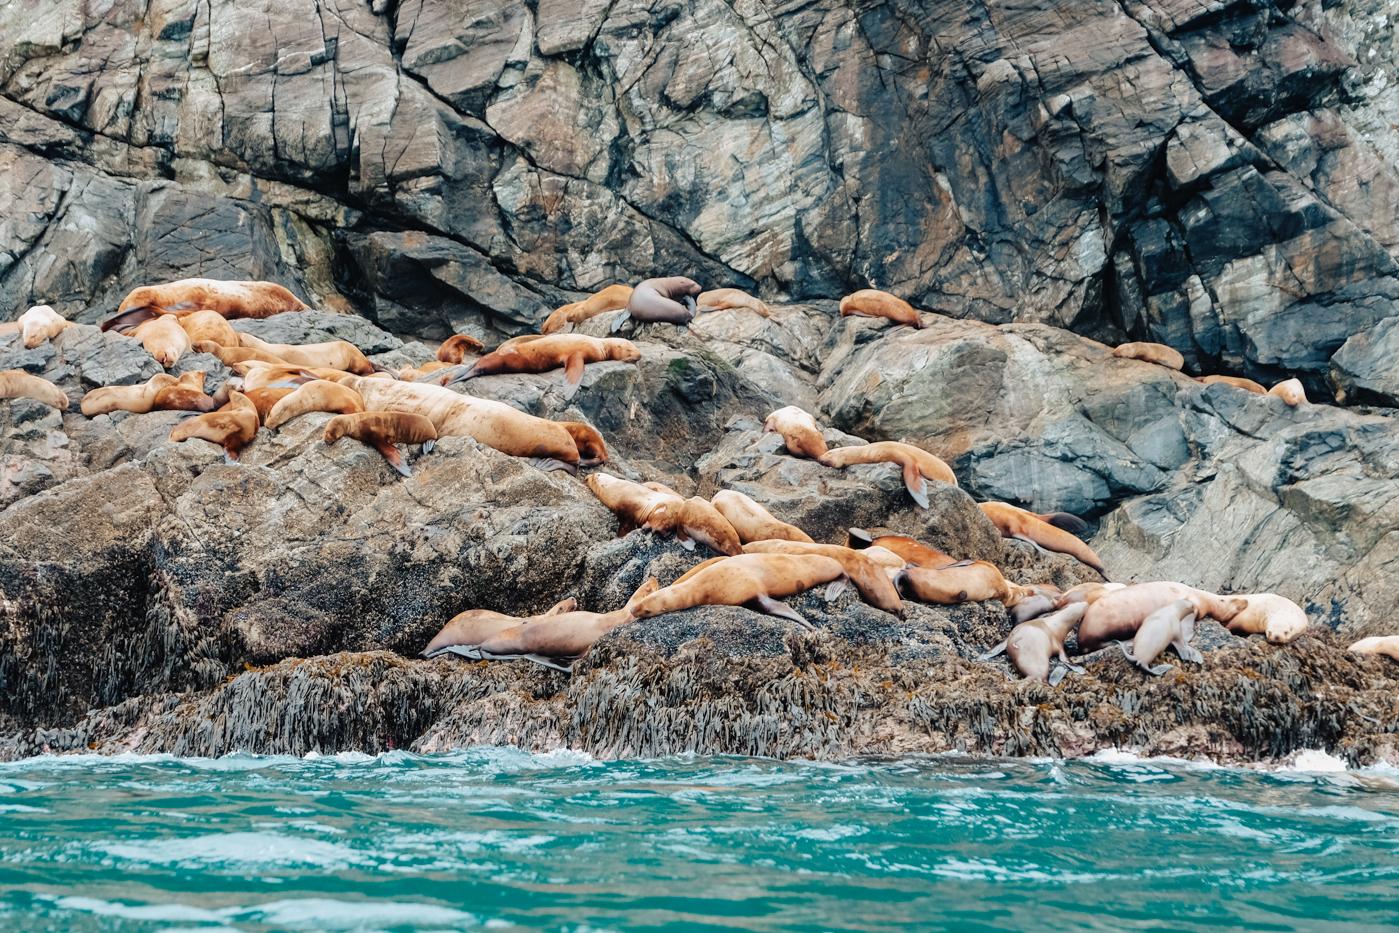 inian-islands-sea-lions.jpg